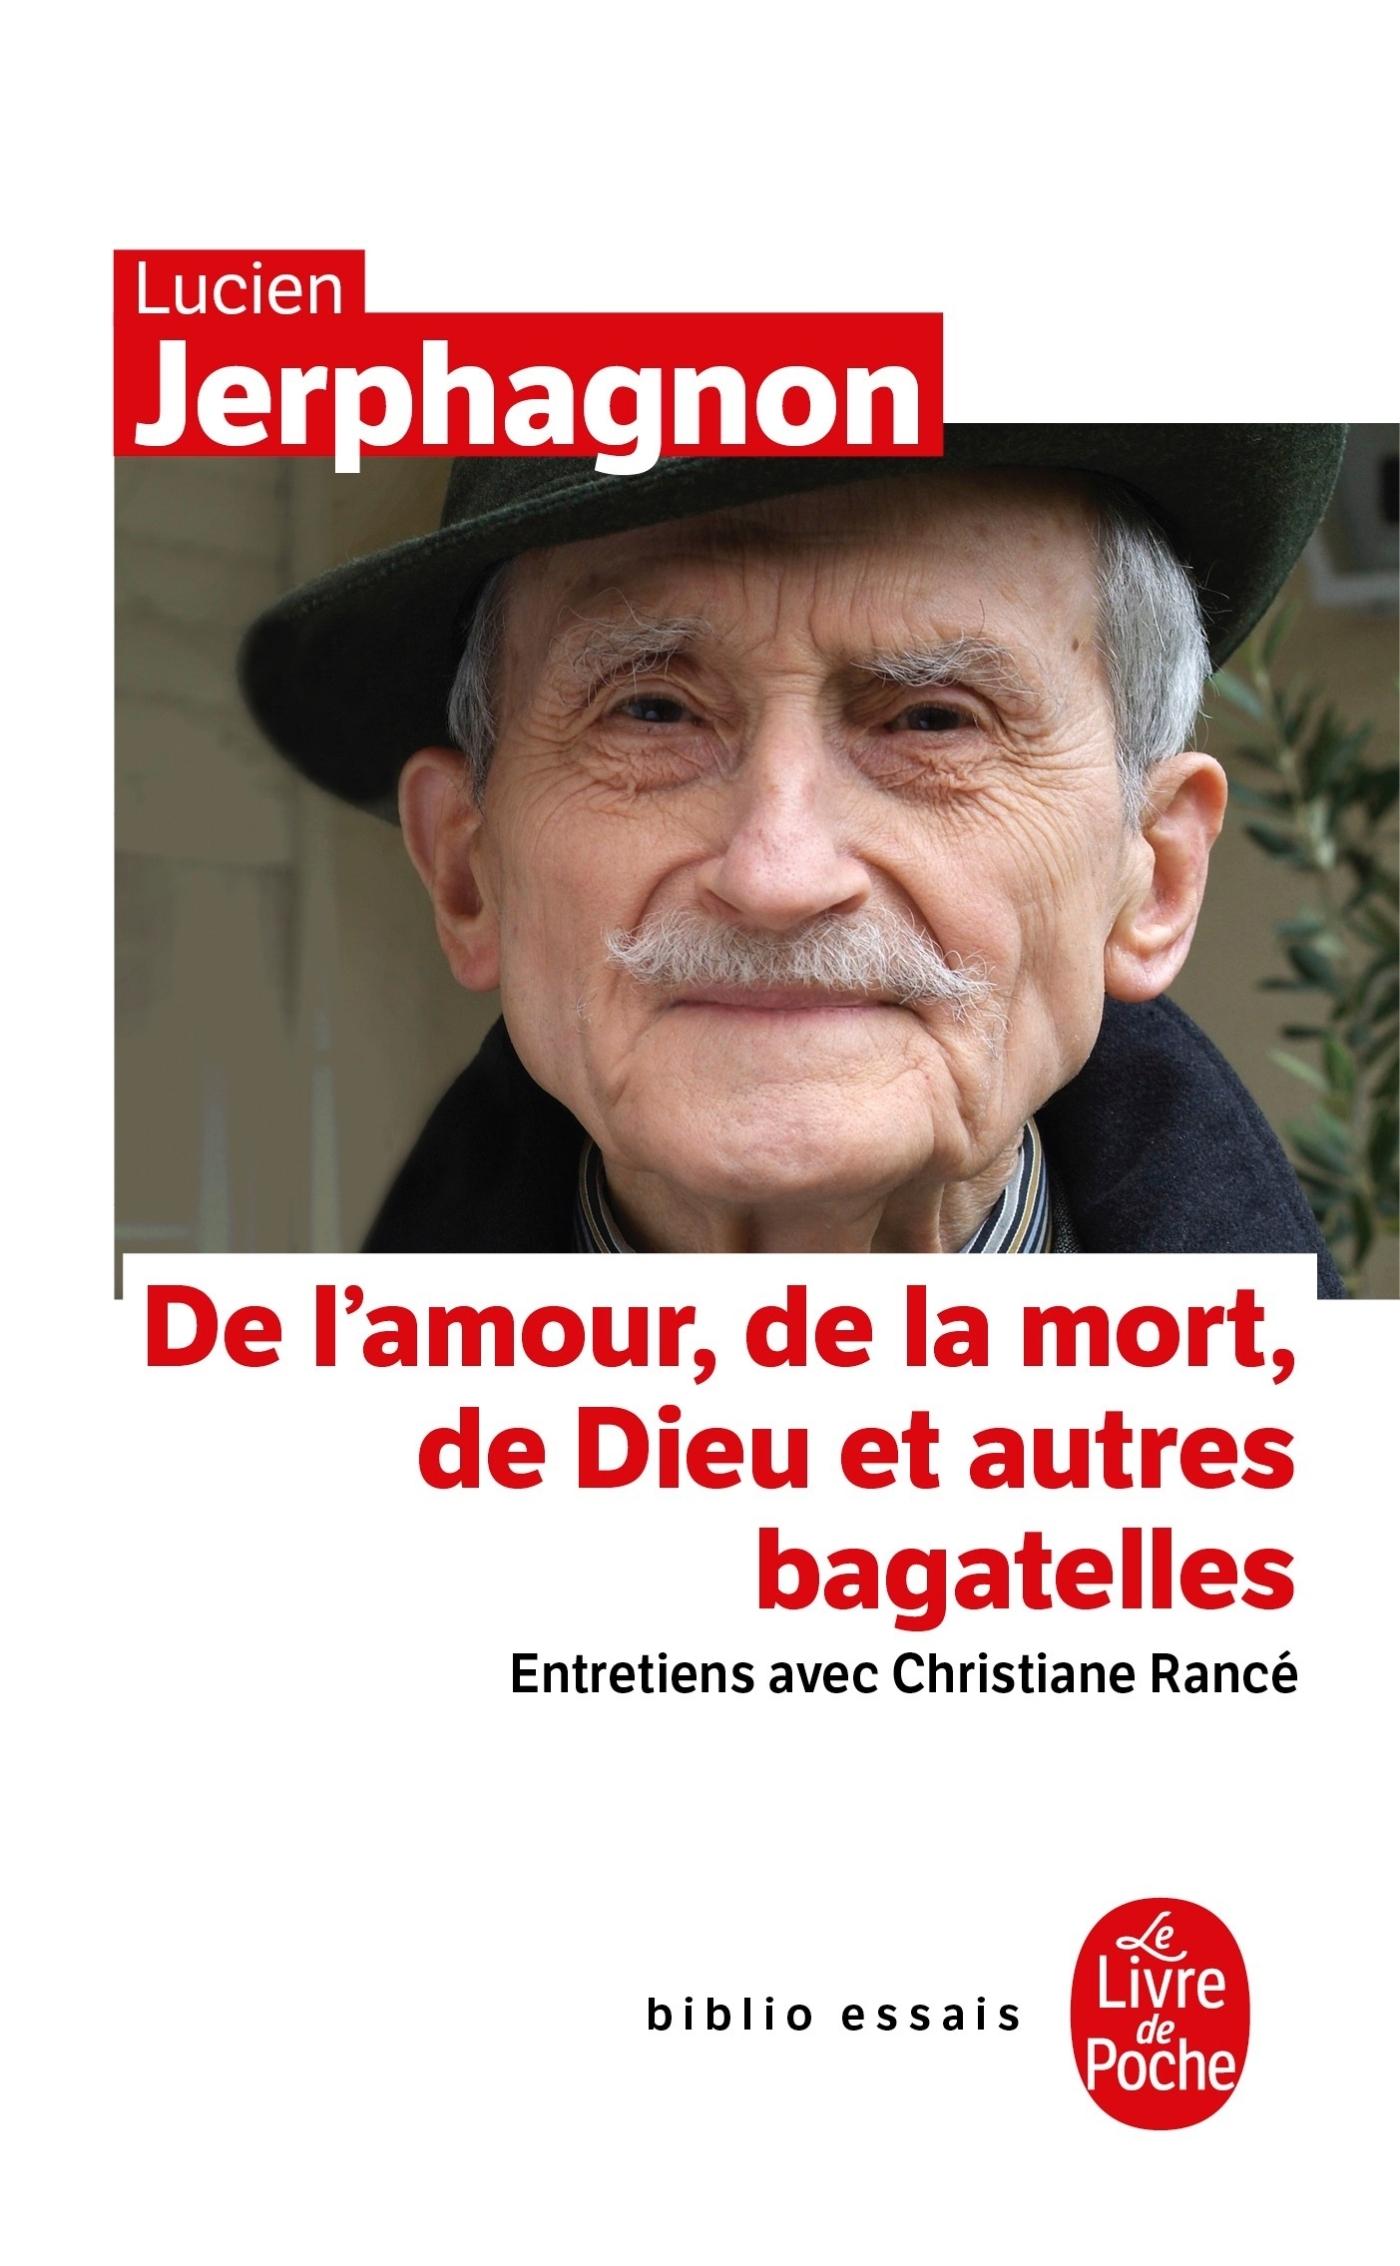 DE L'AMOUR, DE LA MORT, DE DIEU ...